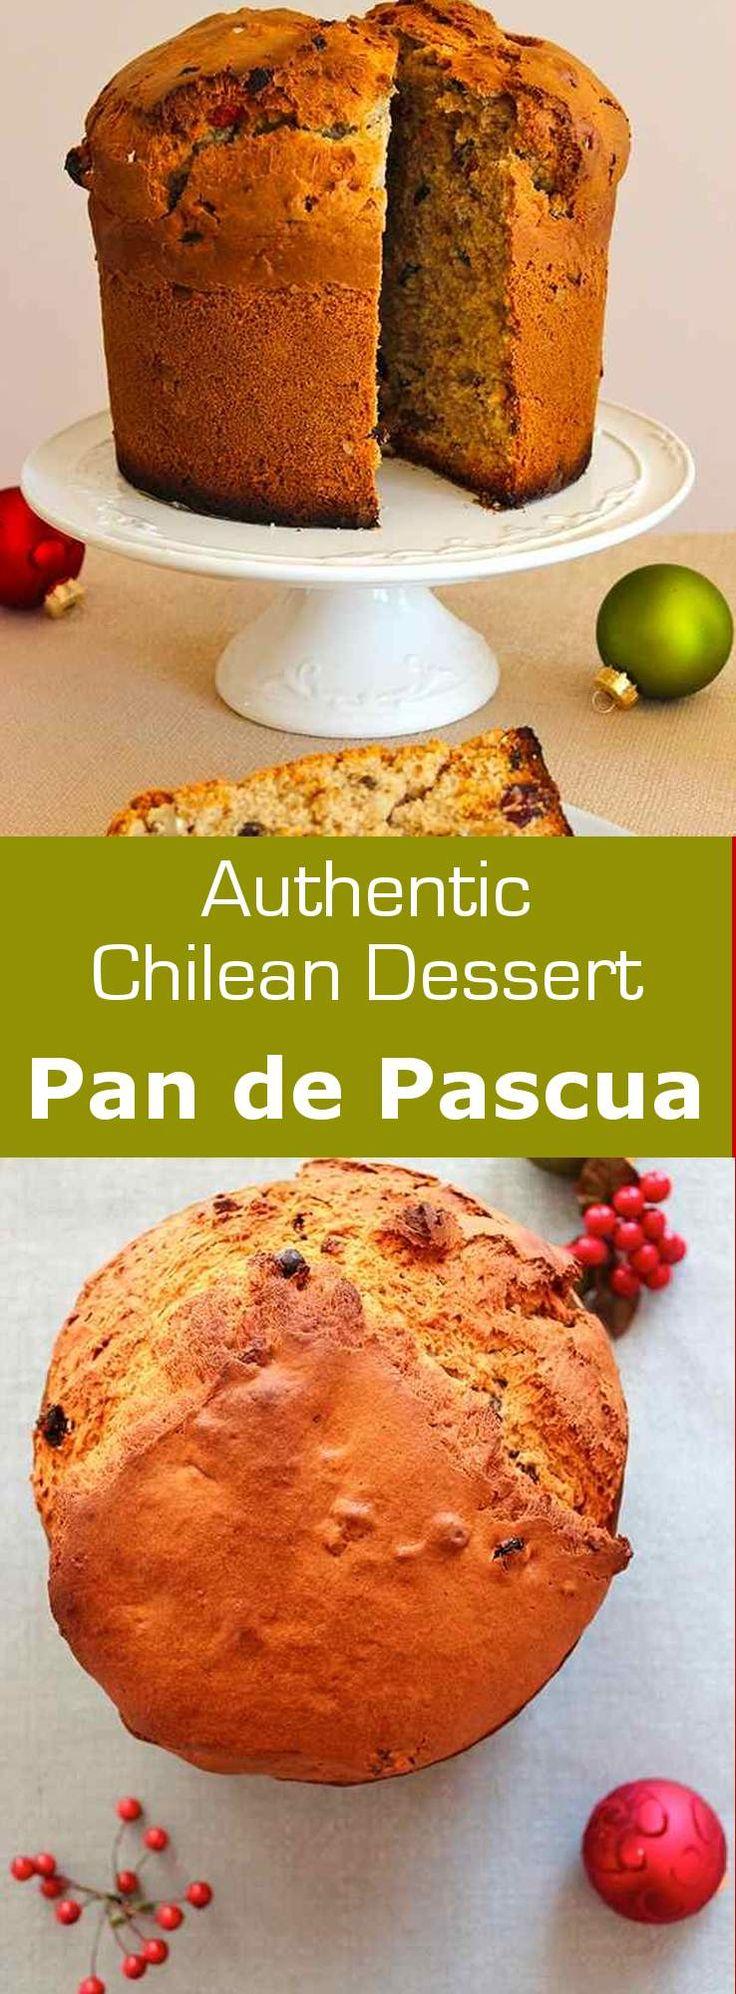 Chilean Pan de Pascua